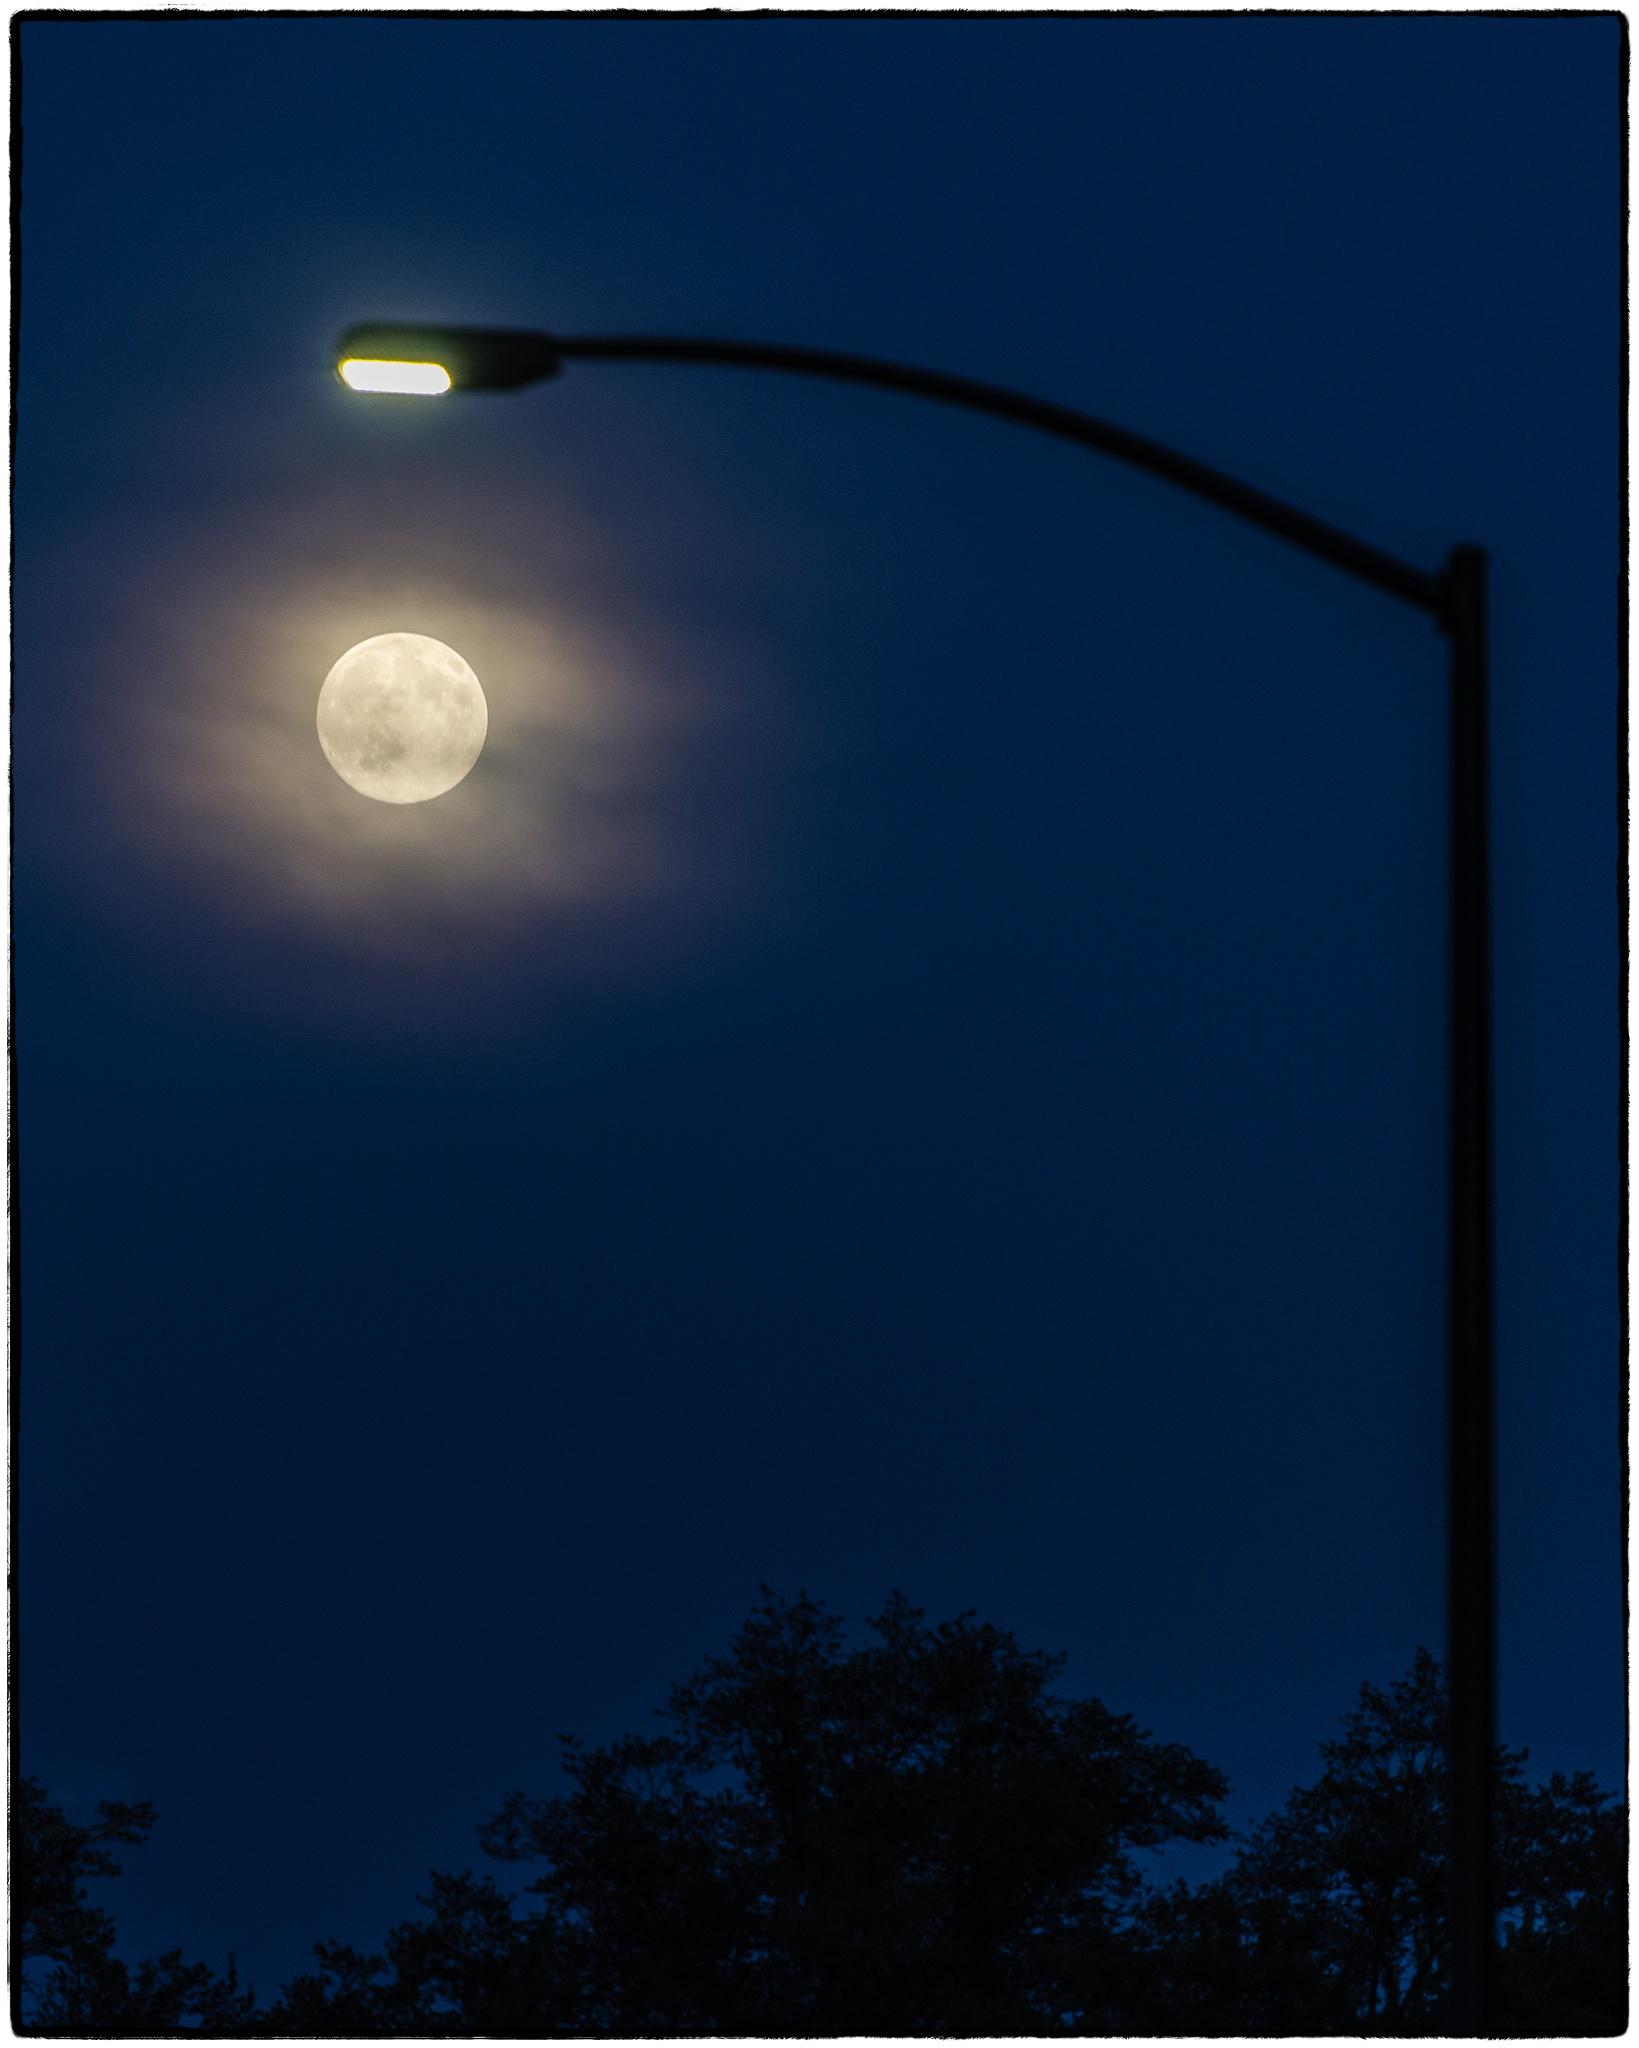 Moon / Light by Don Johnson